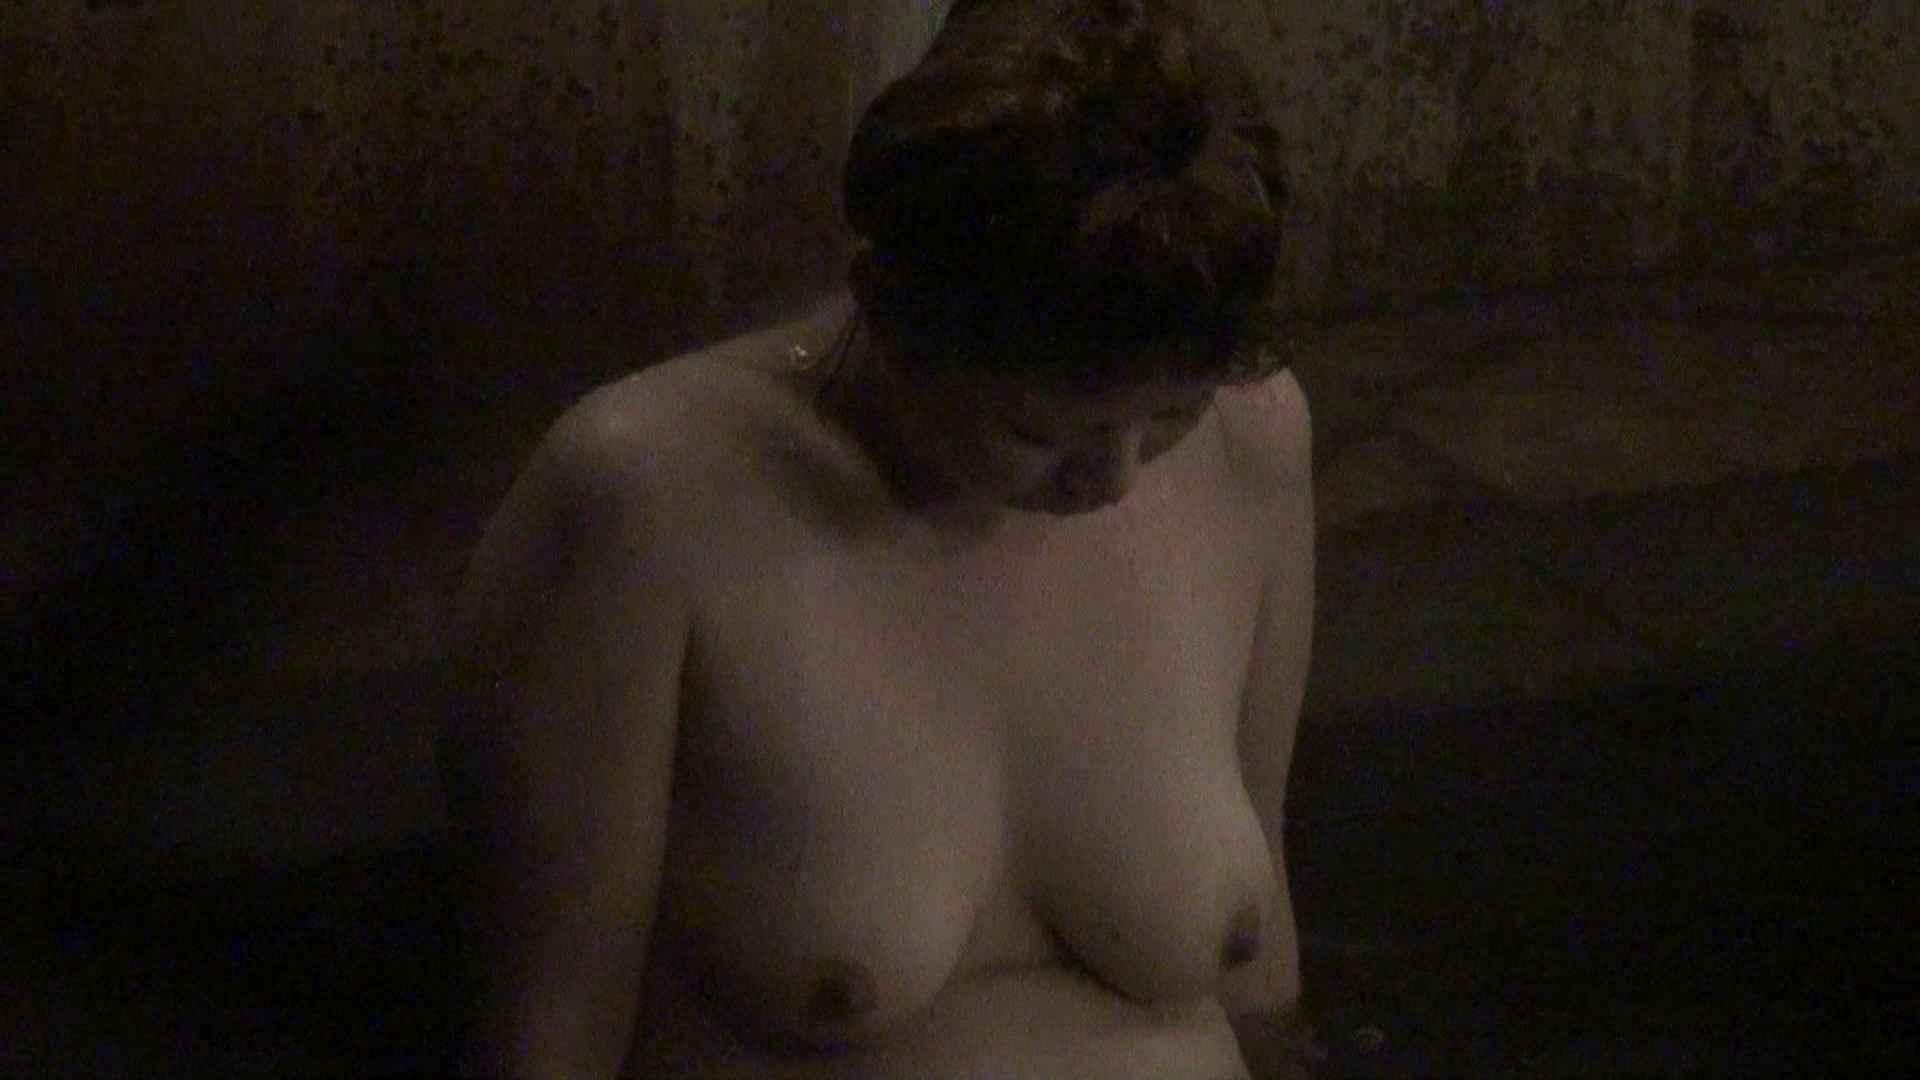 Aquaな露天風呂Vol.377 0  33連発 30